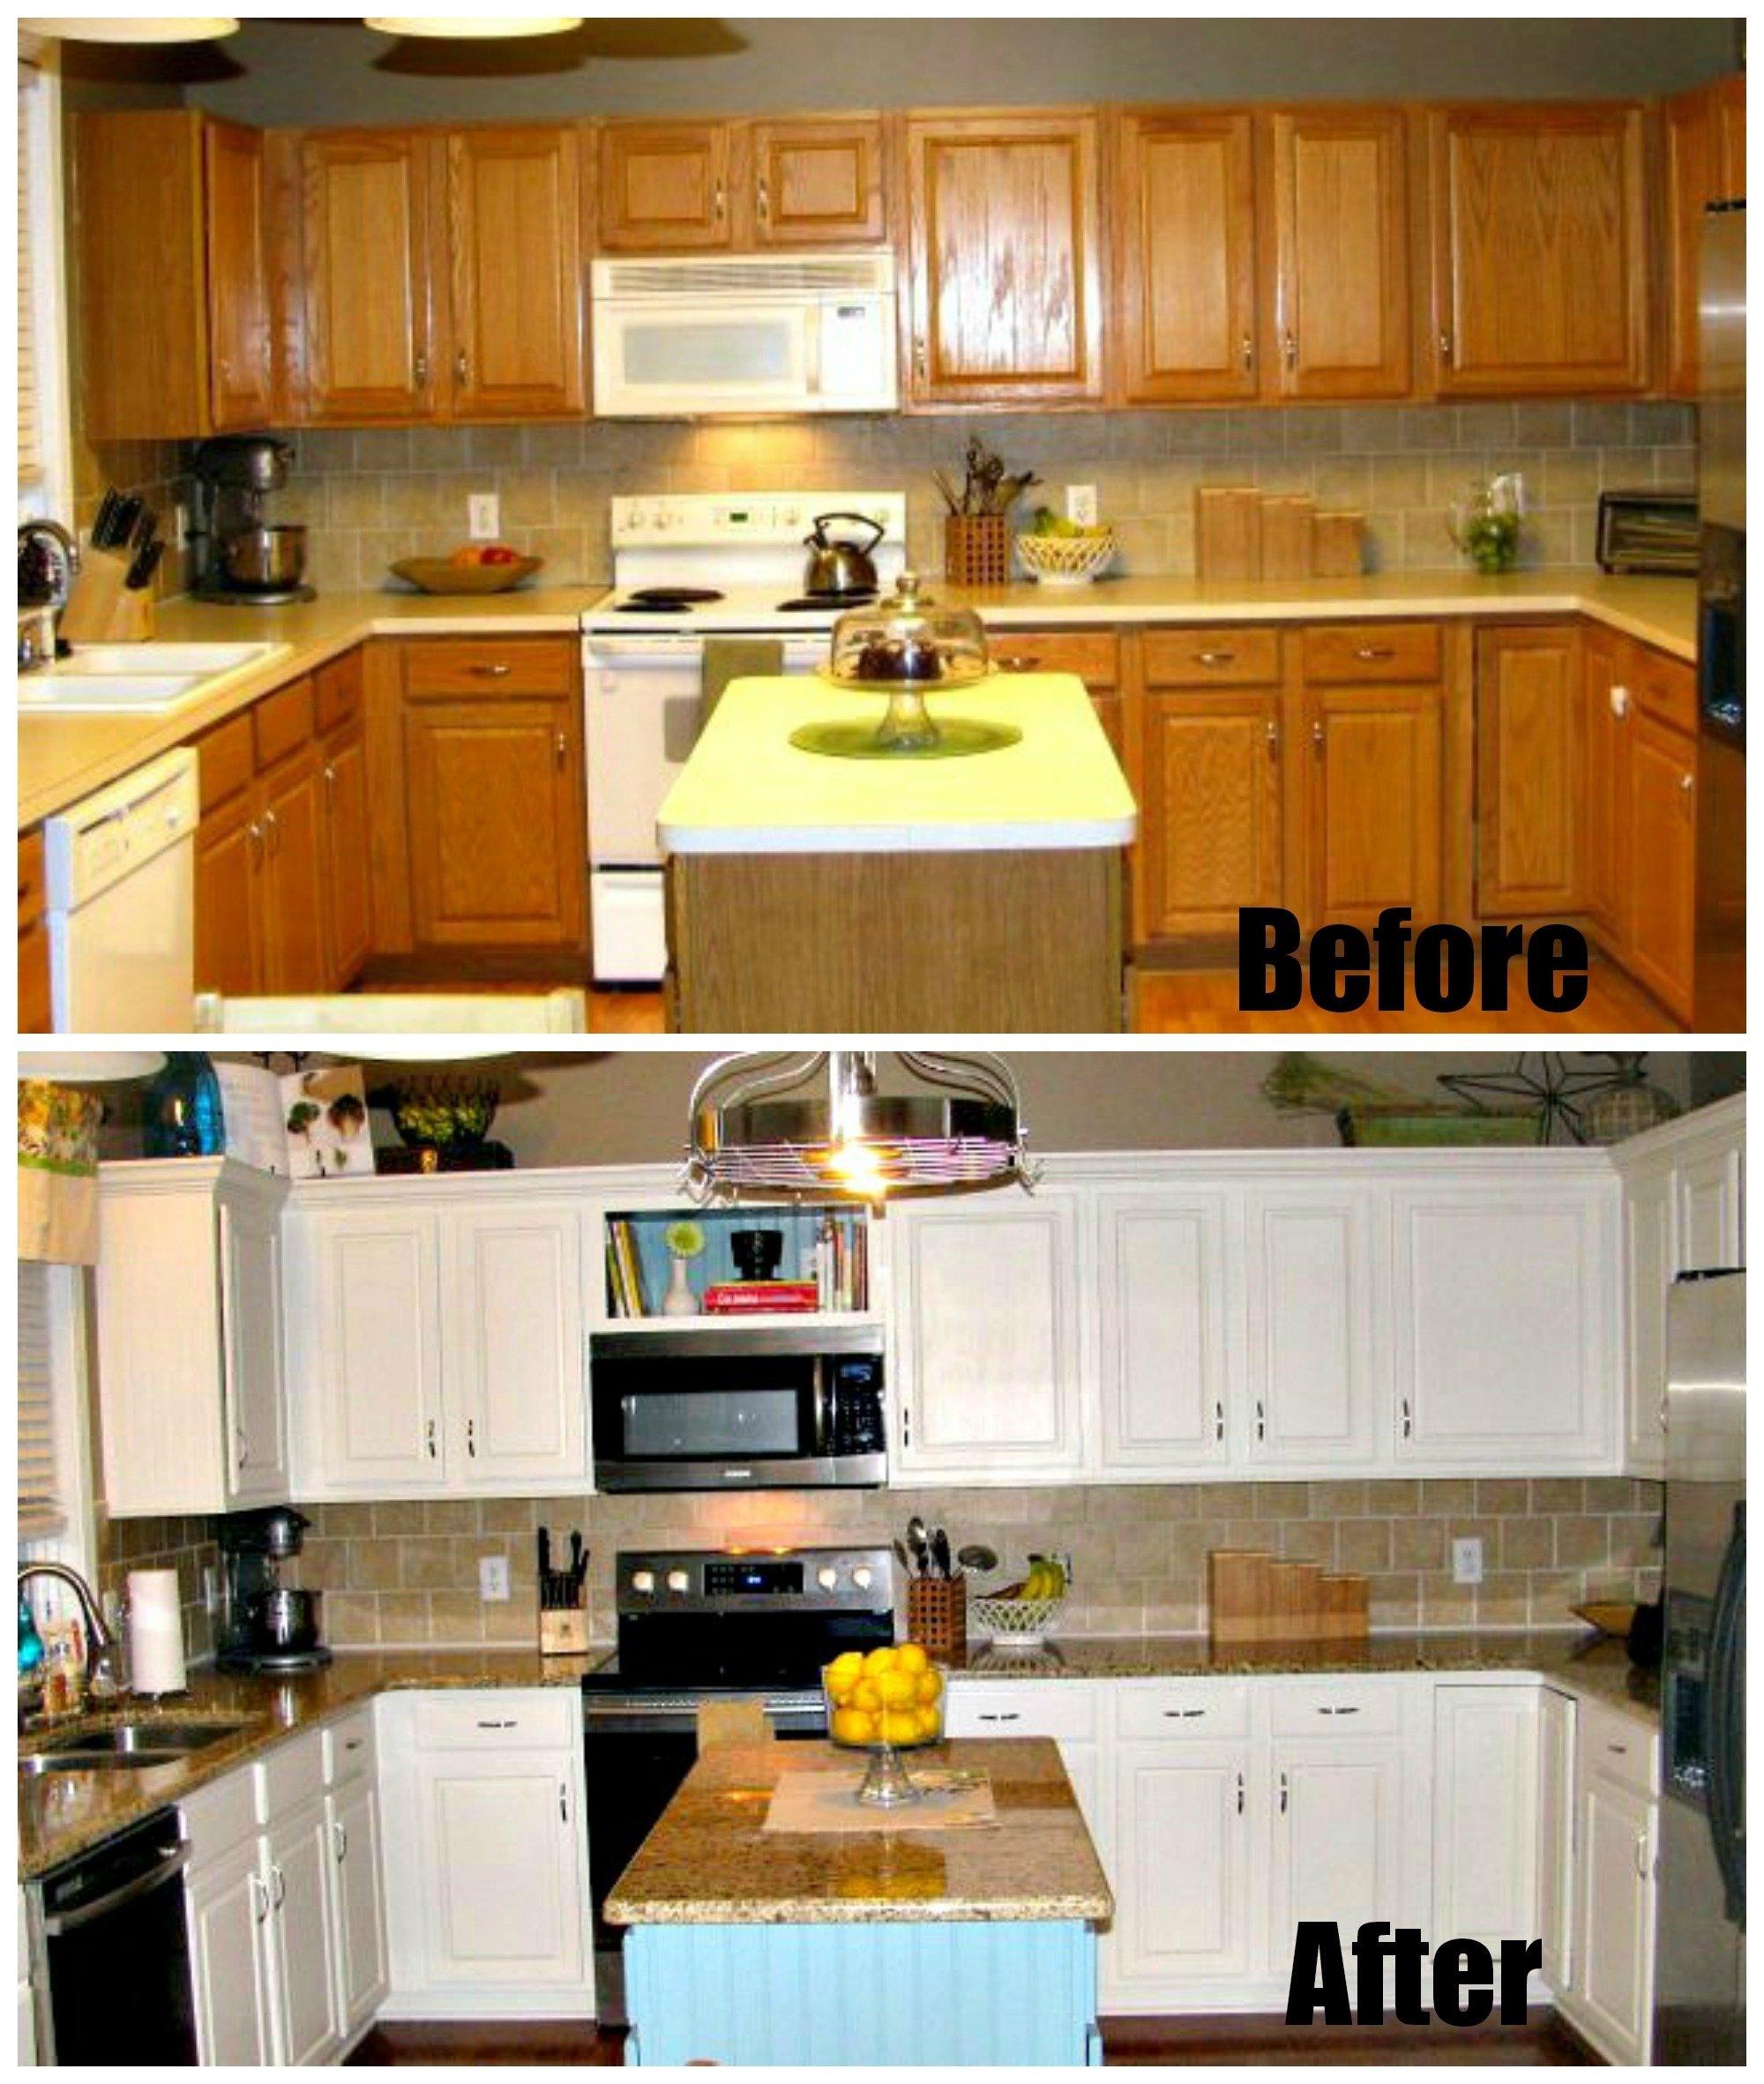 10 Best Kitchen Remodeling Ideas On A Budget impressive kitchen remodeling ideas on a budget budget kitchen 2021